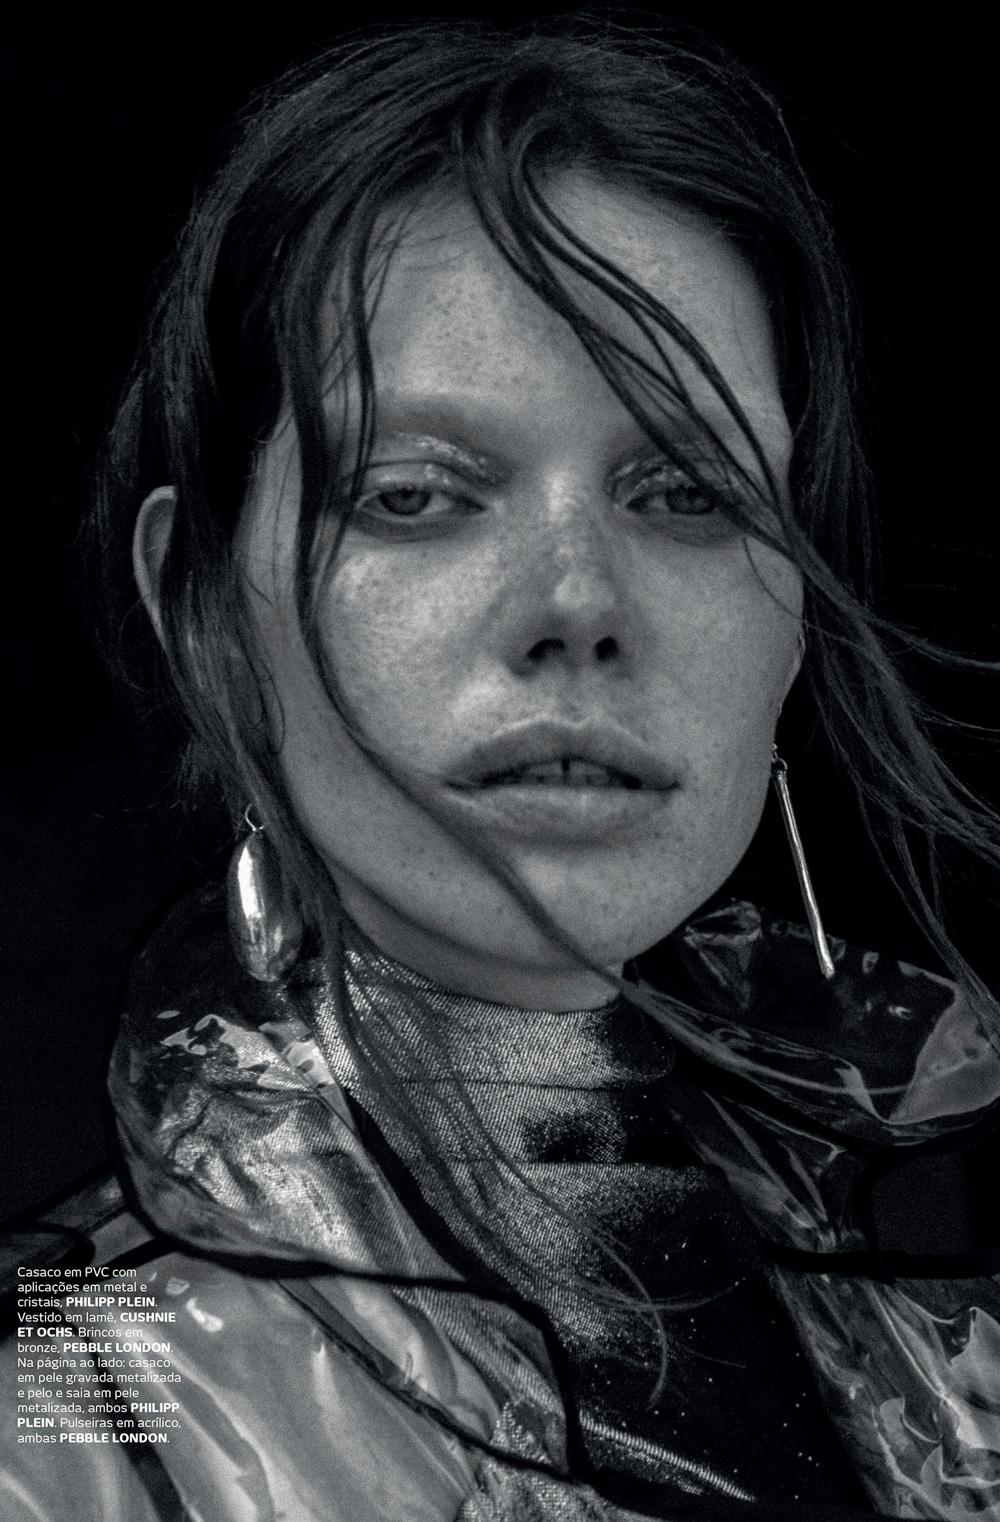 Vogue-Portugal-Nika-Rusakova-Filip-Koludrovic-6.jpg